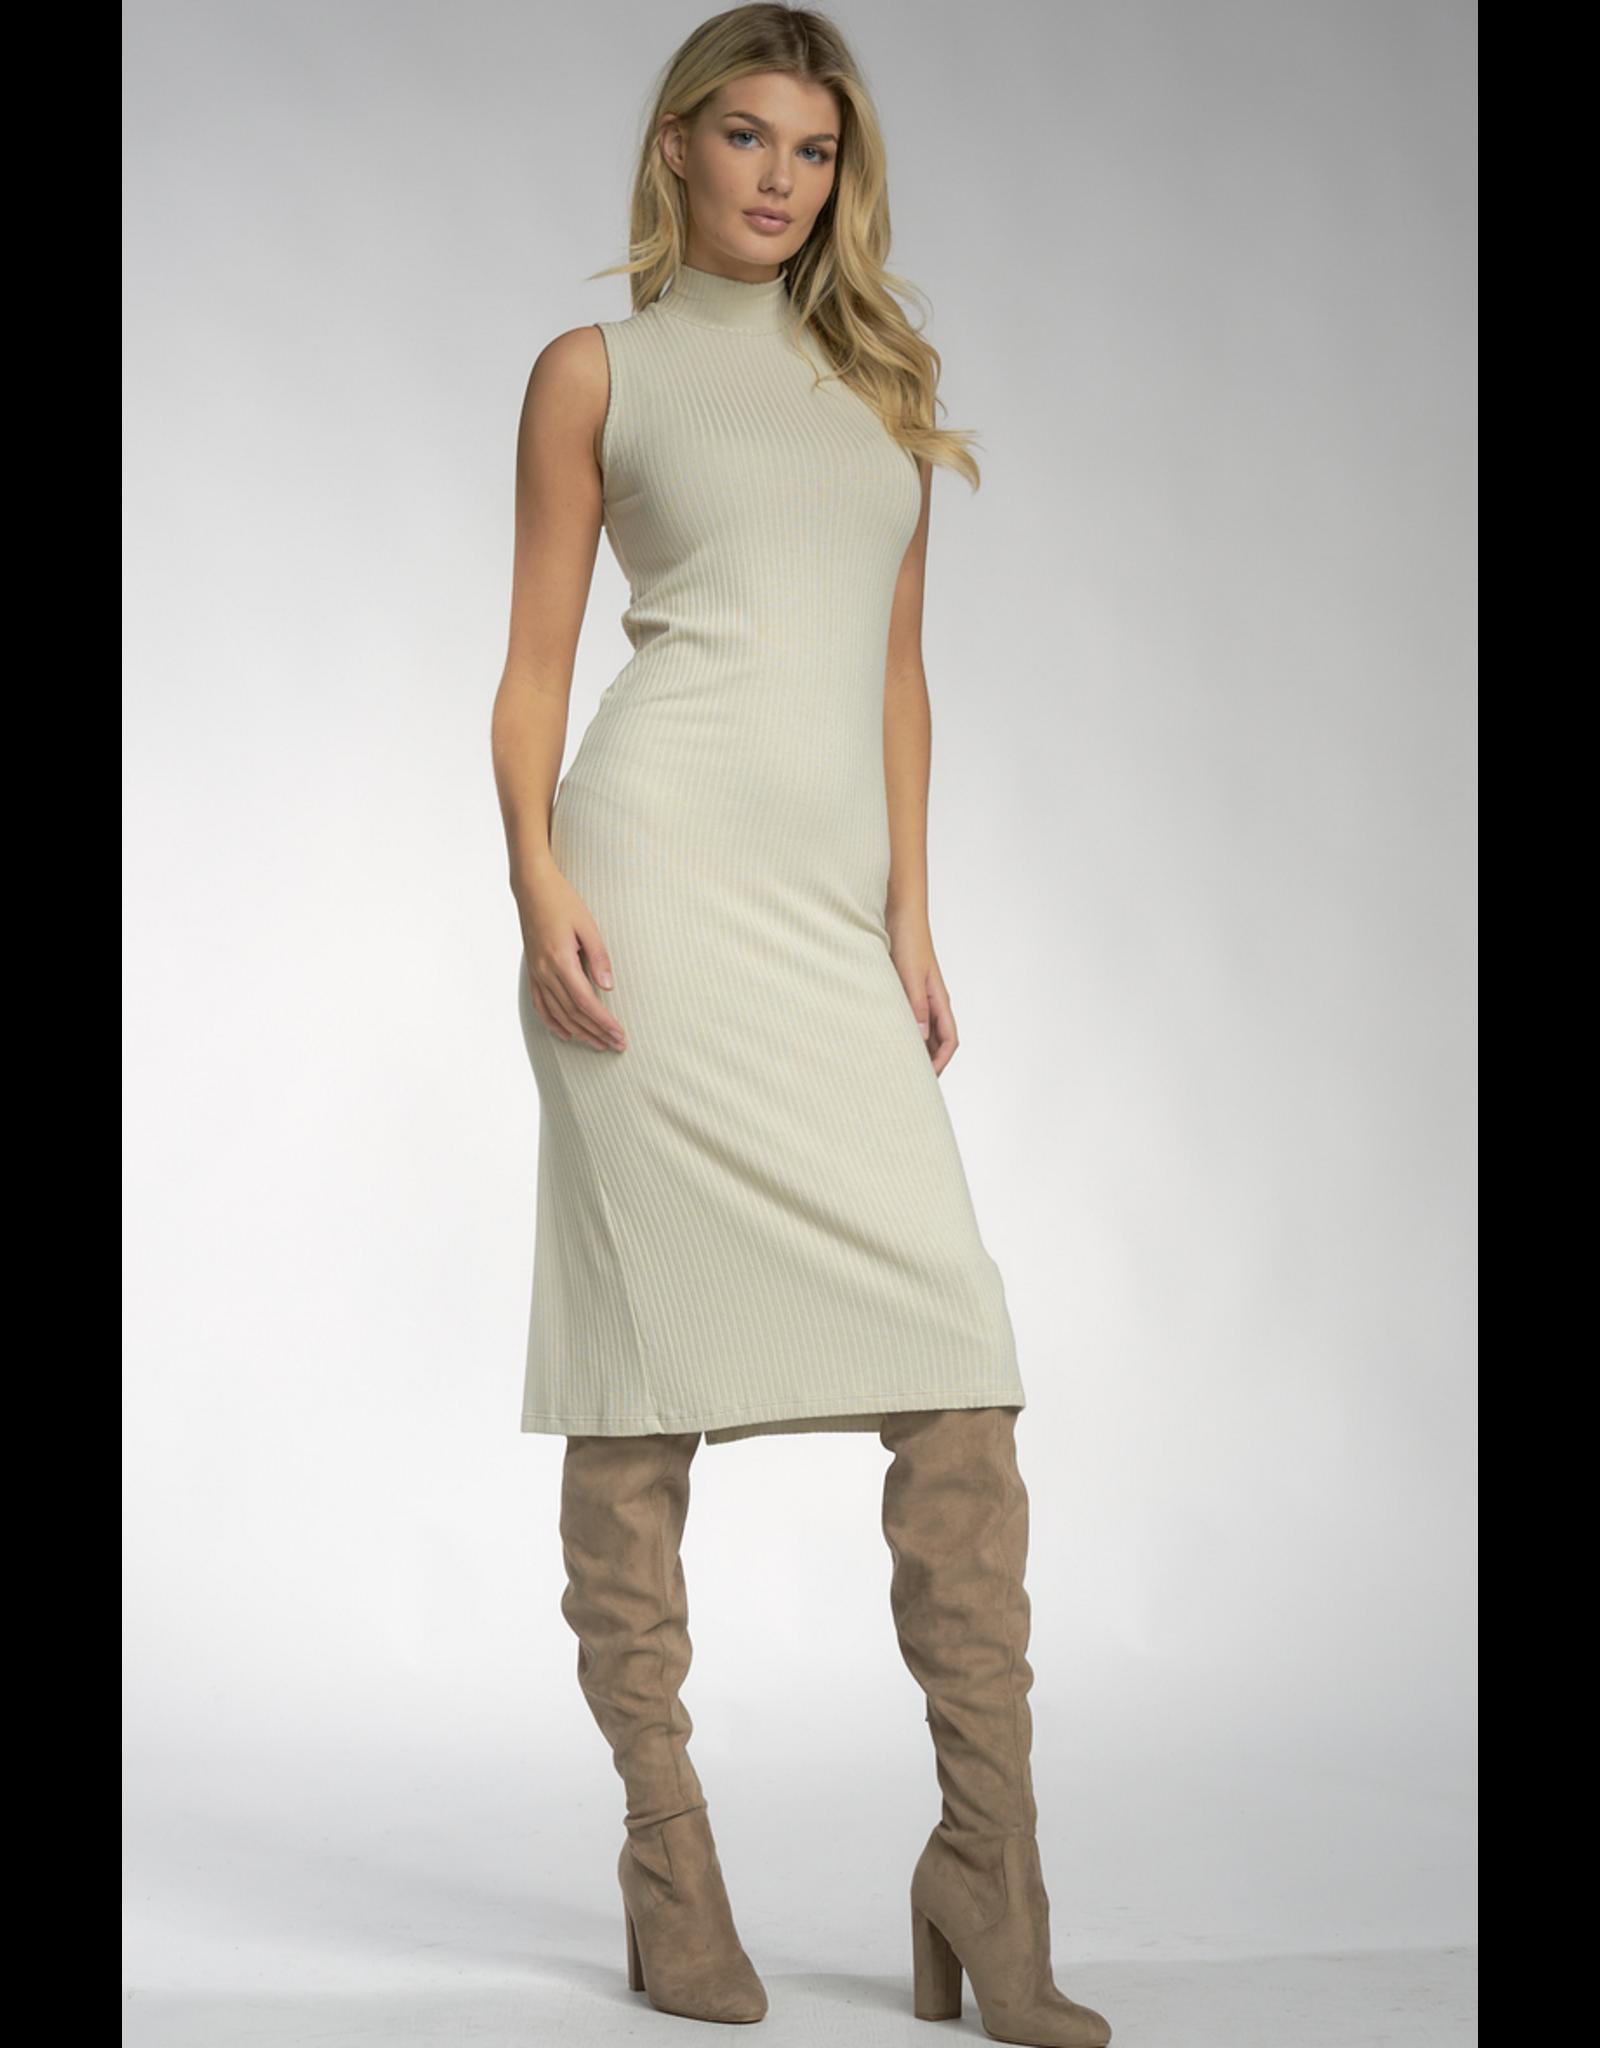 Elan Sleeveless Mock Neck Dress